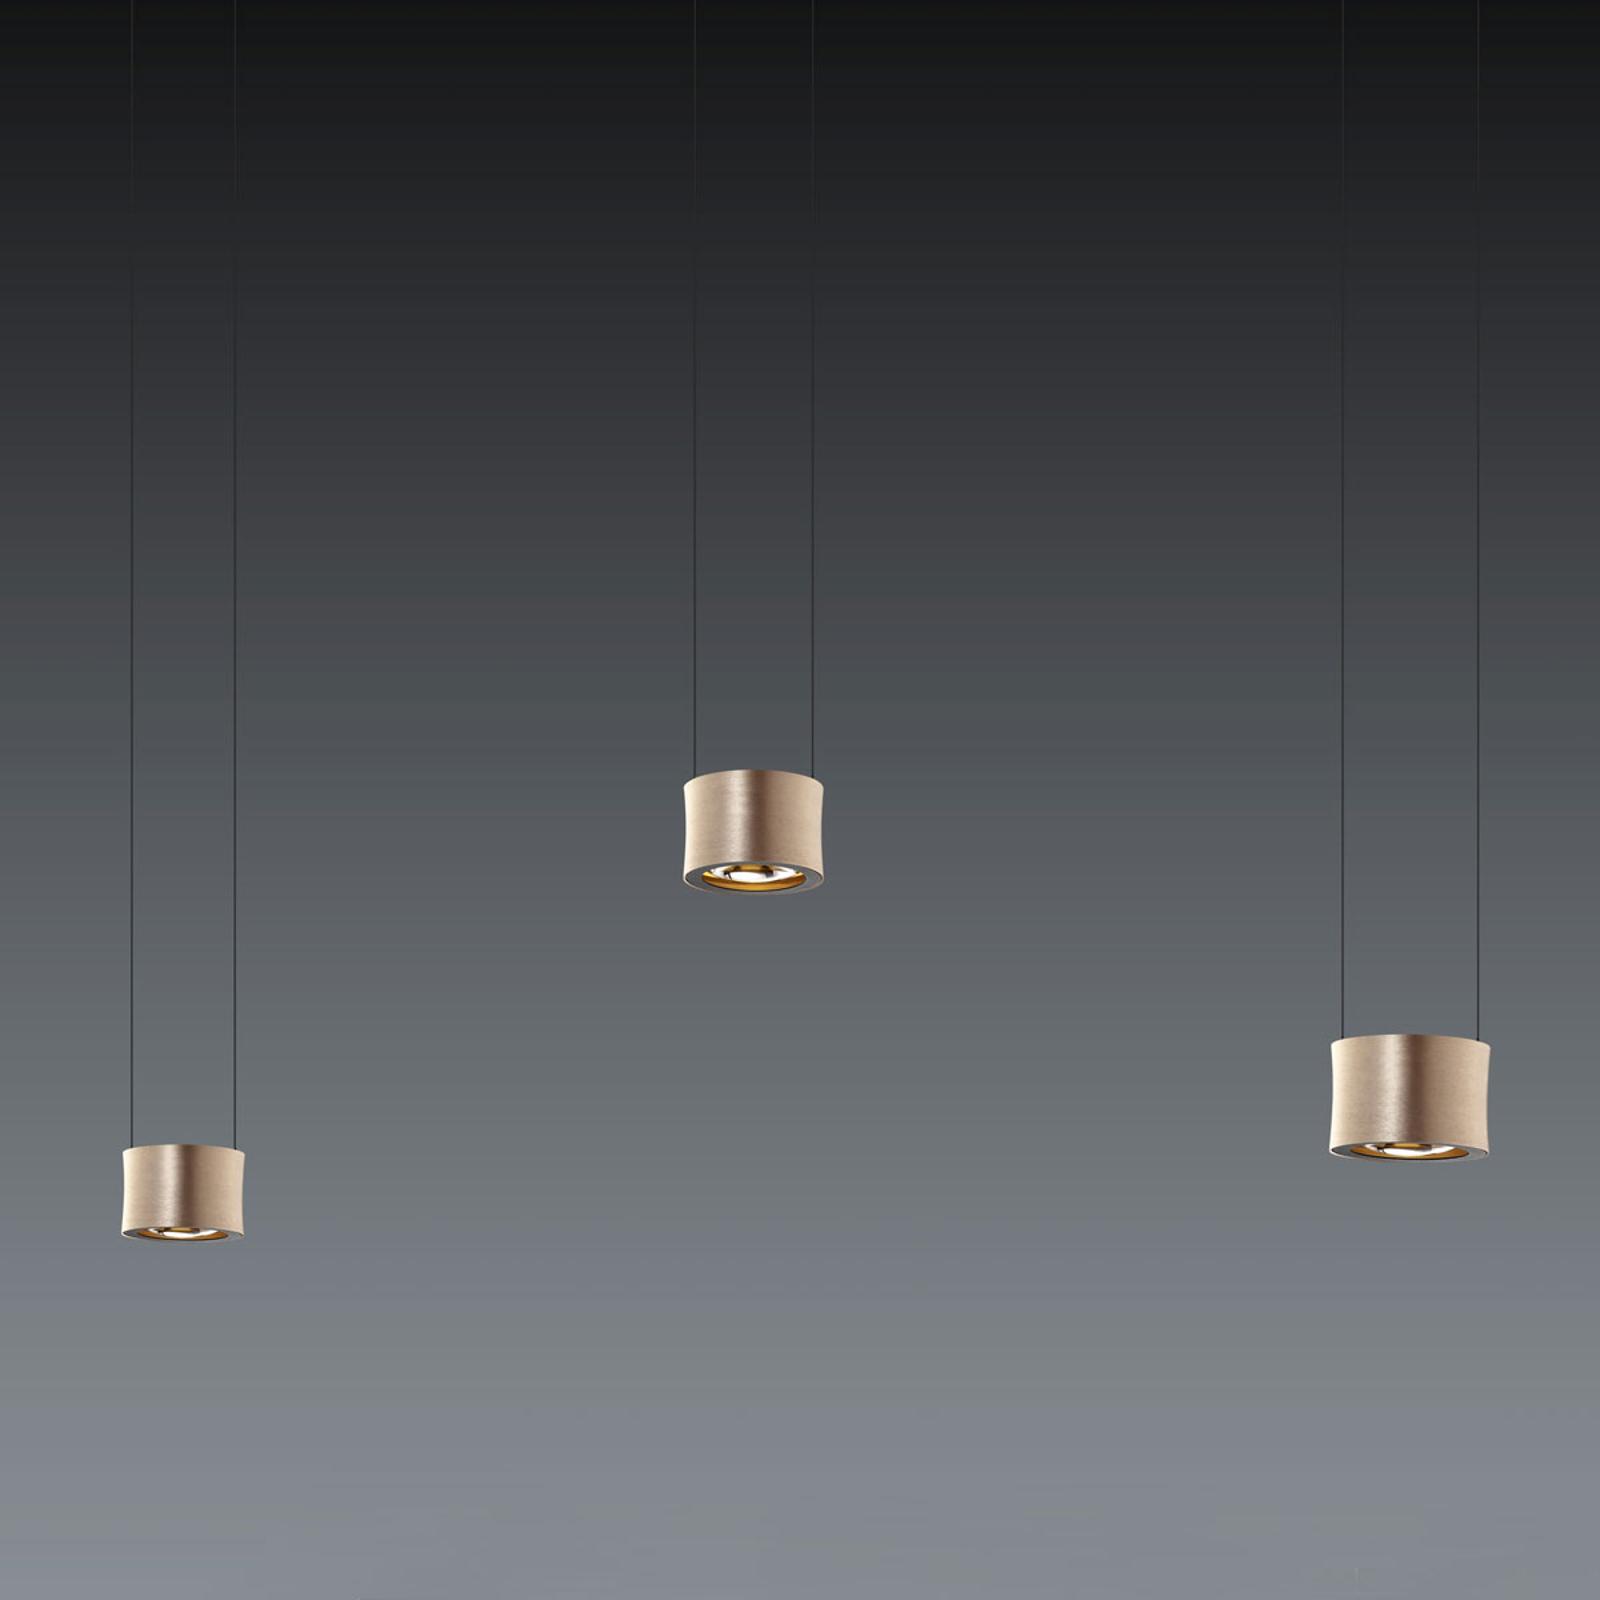 BANKAMP Impulse lampa wisząca LED 3-pkt.